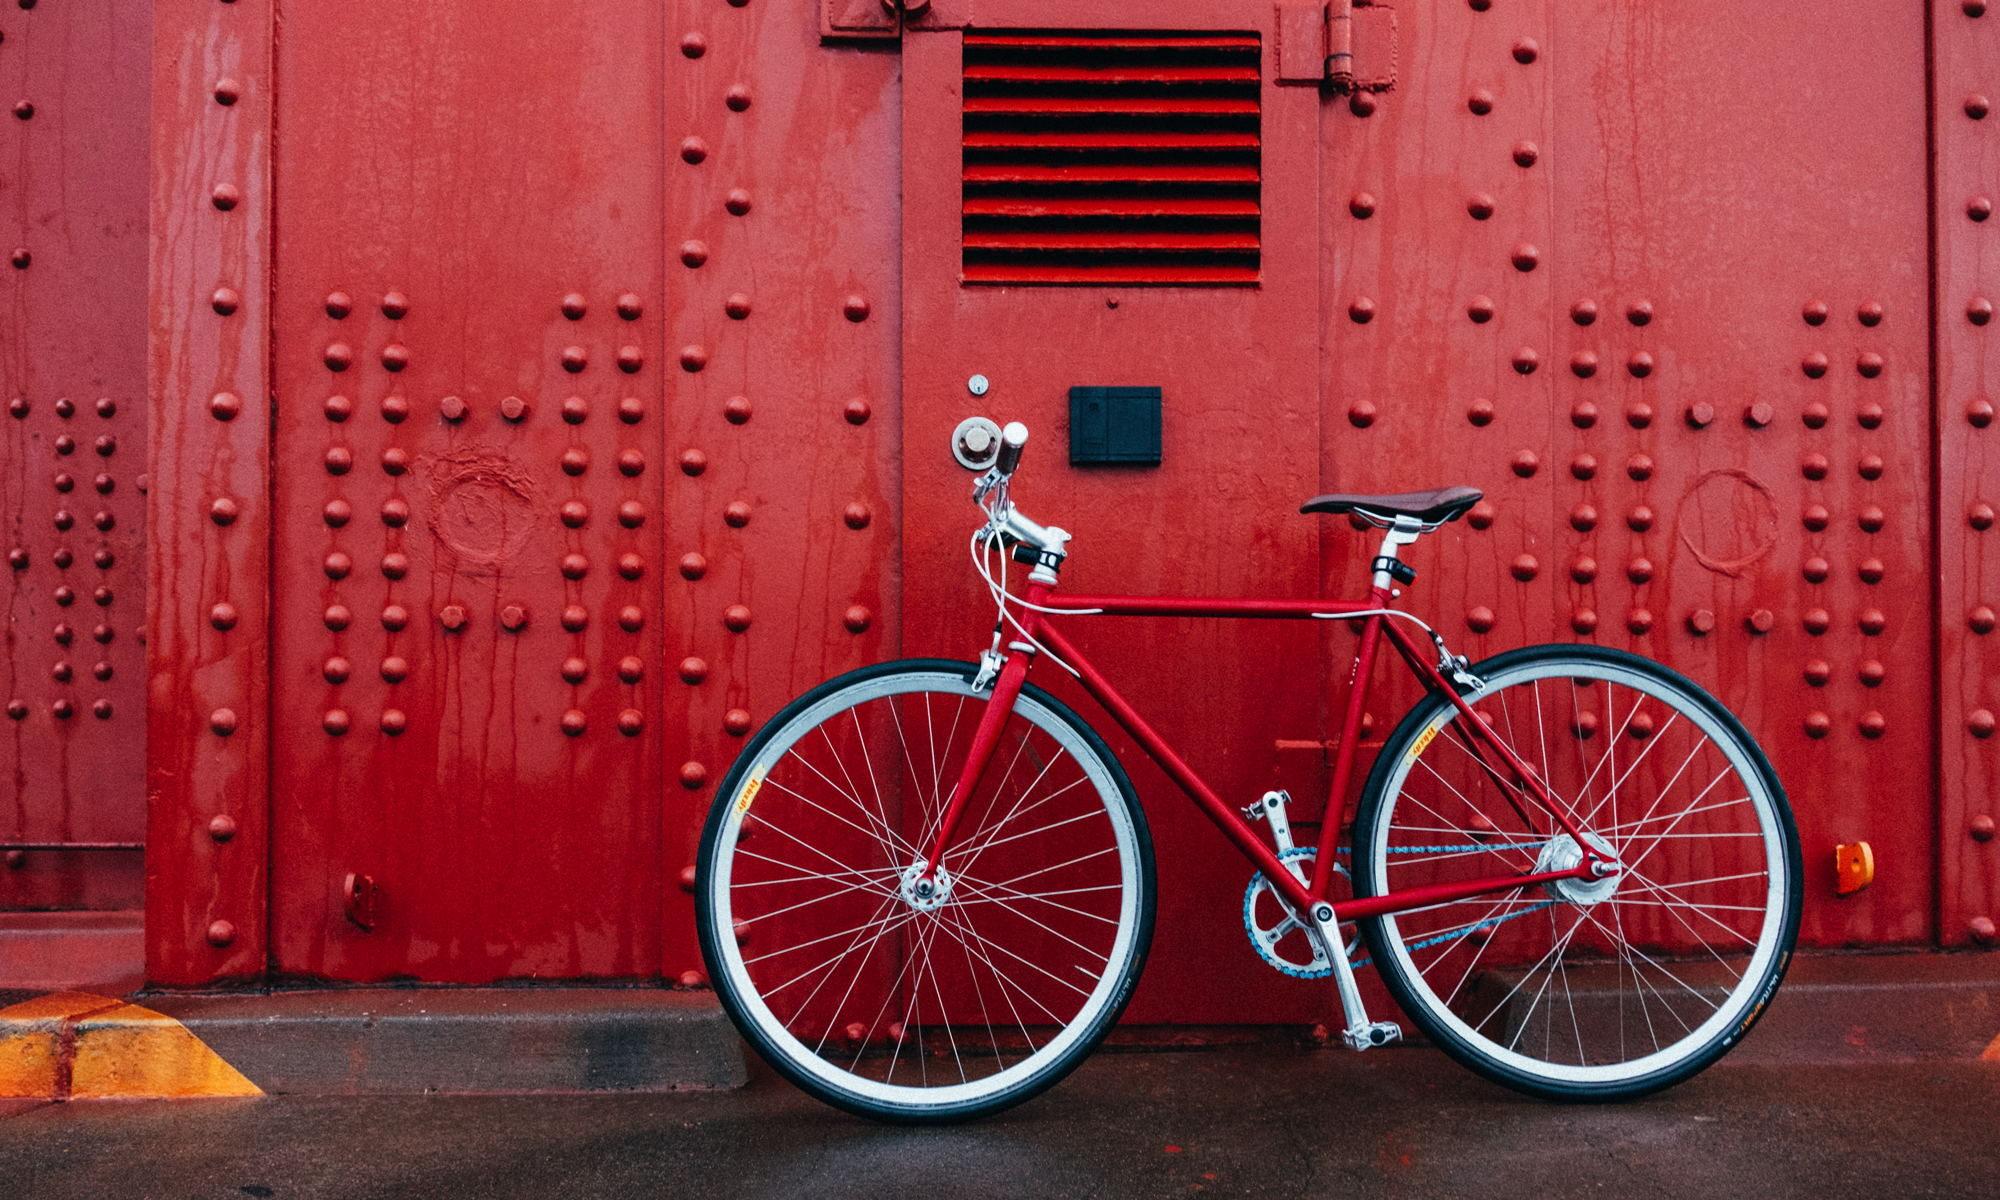 Kiama Cycles and Sports